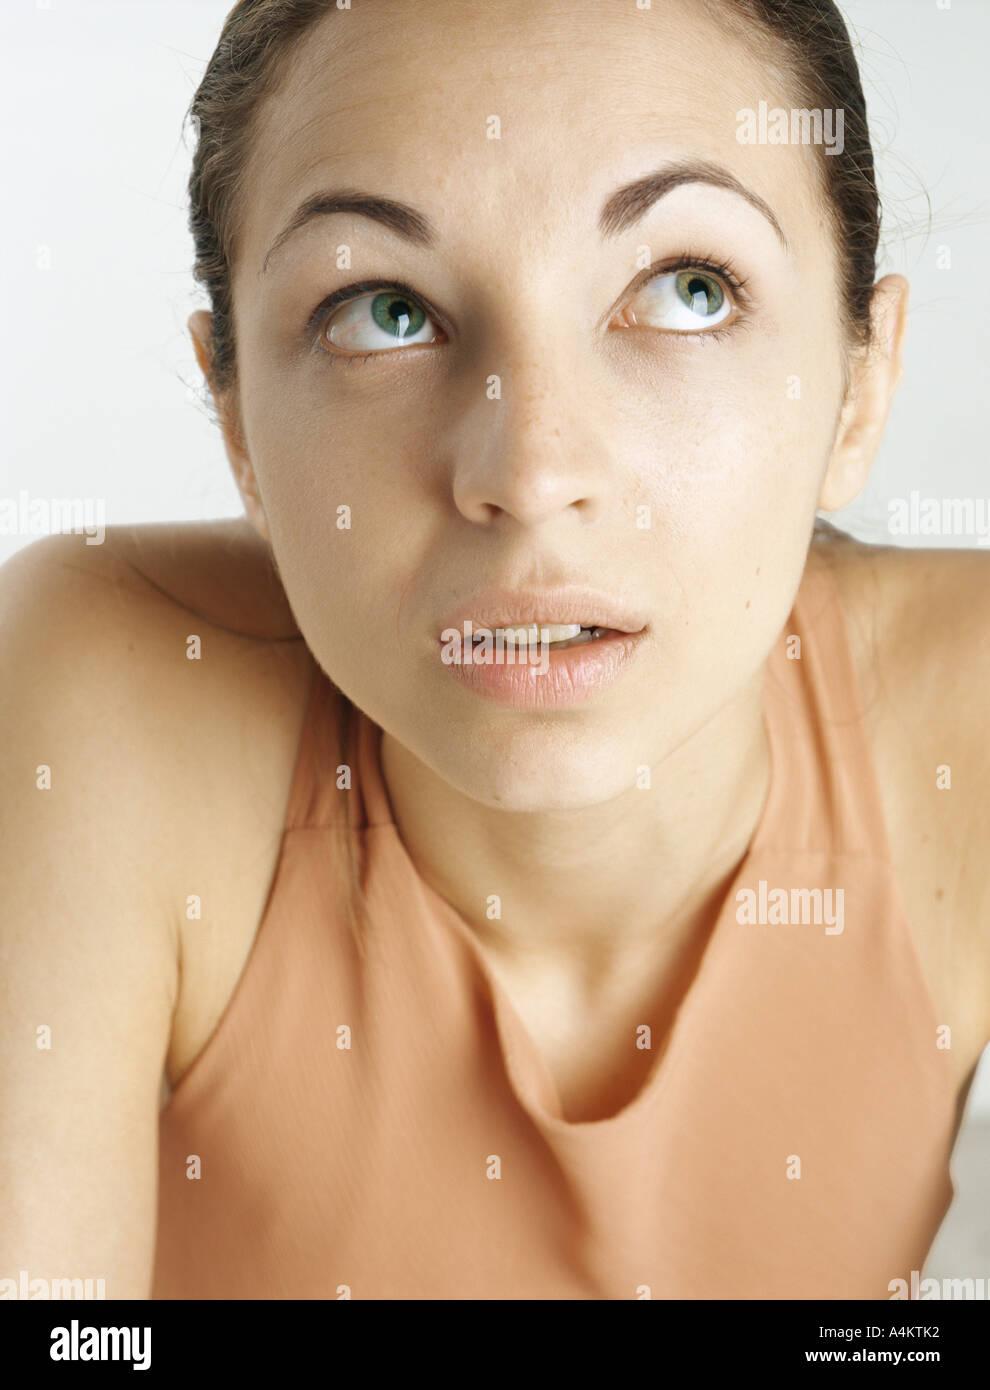 Raised Eyebrows Gallery Eye Makeup Ideas For Blue Eyes